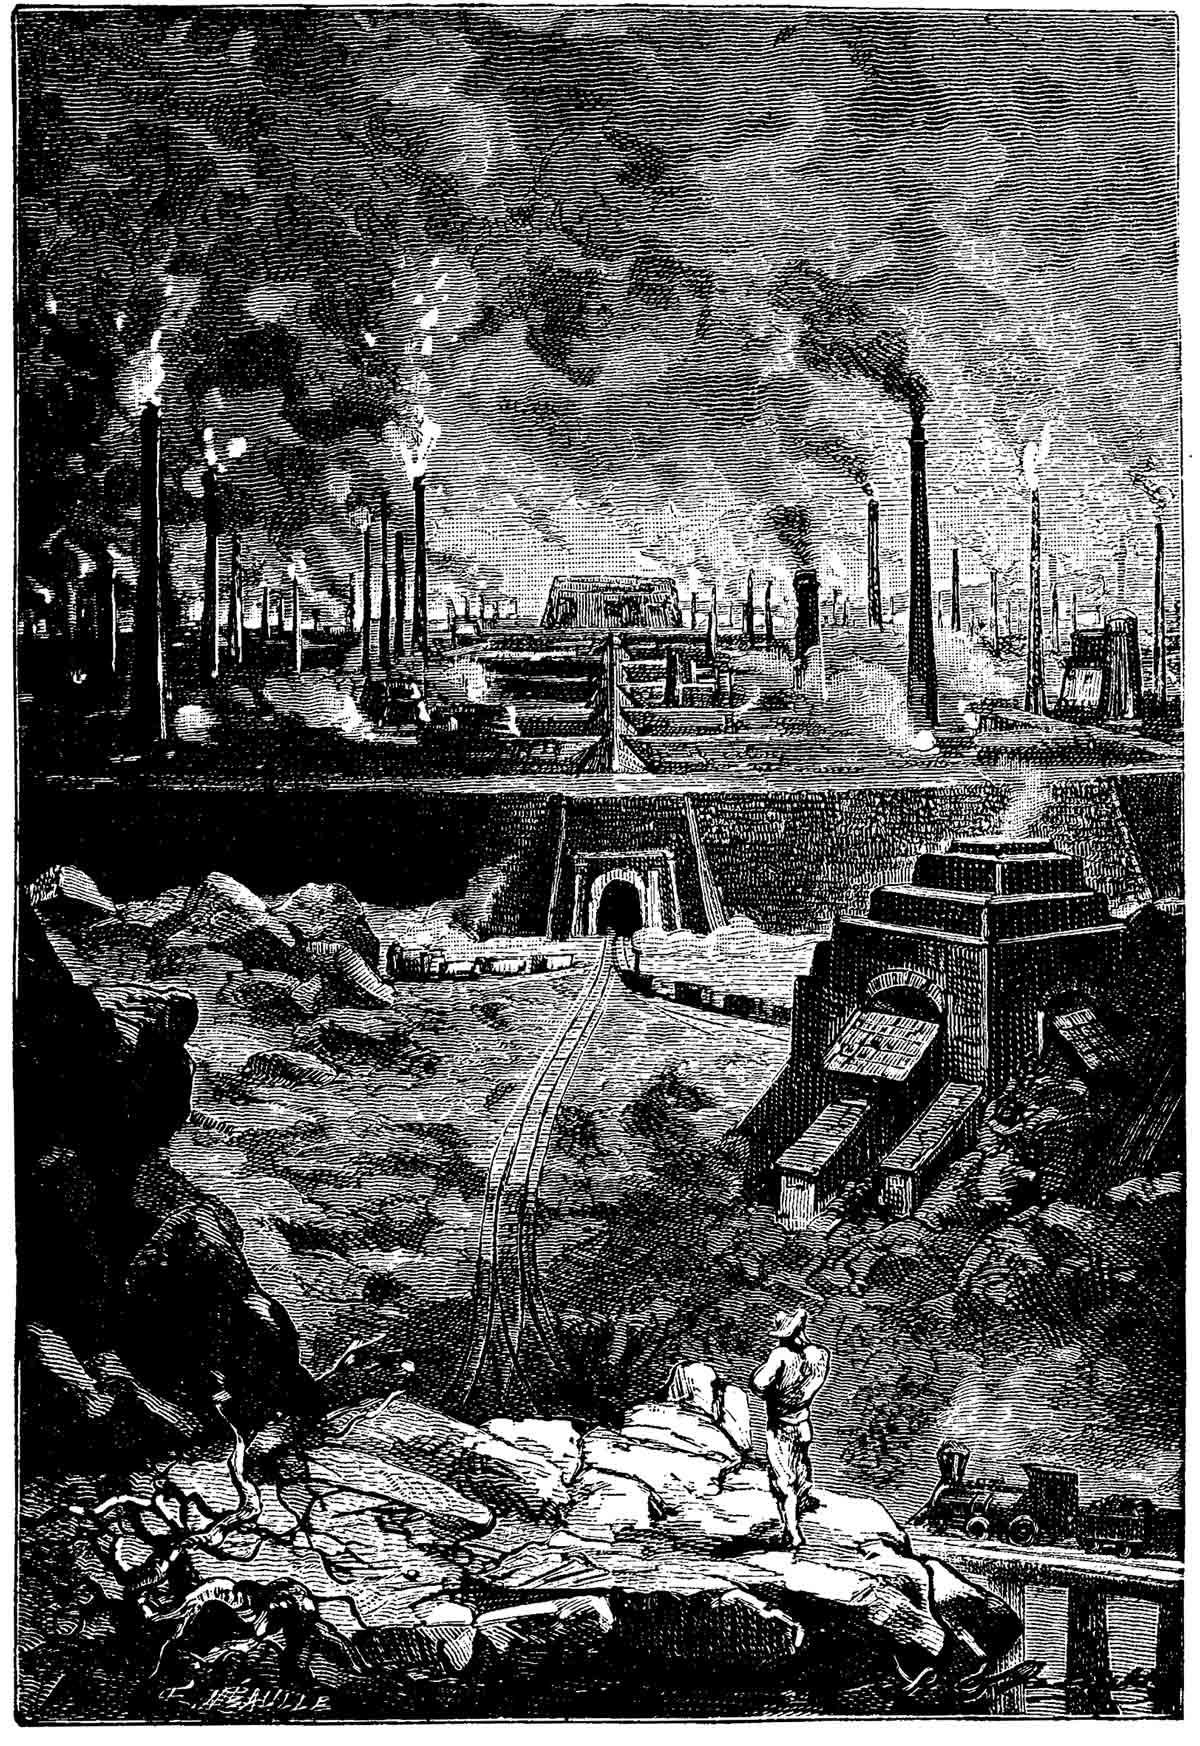 Slanted-1-Steel-Cities_14_Fortune-Ilustration_1879_Public-Domain